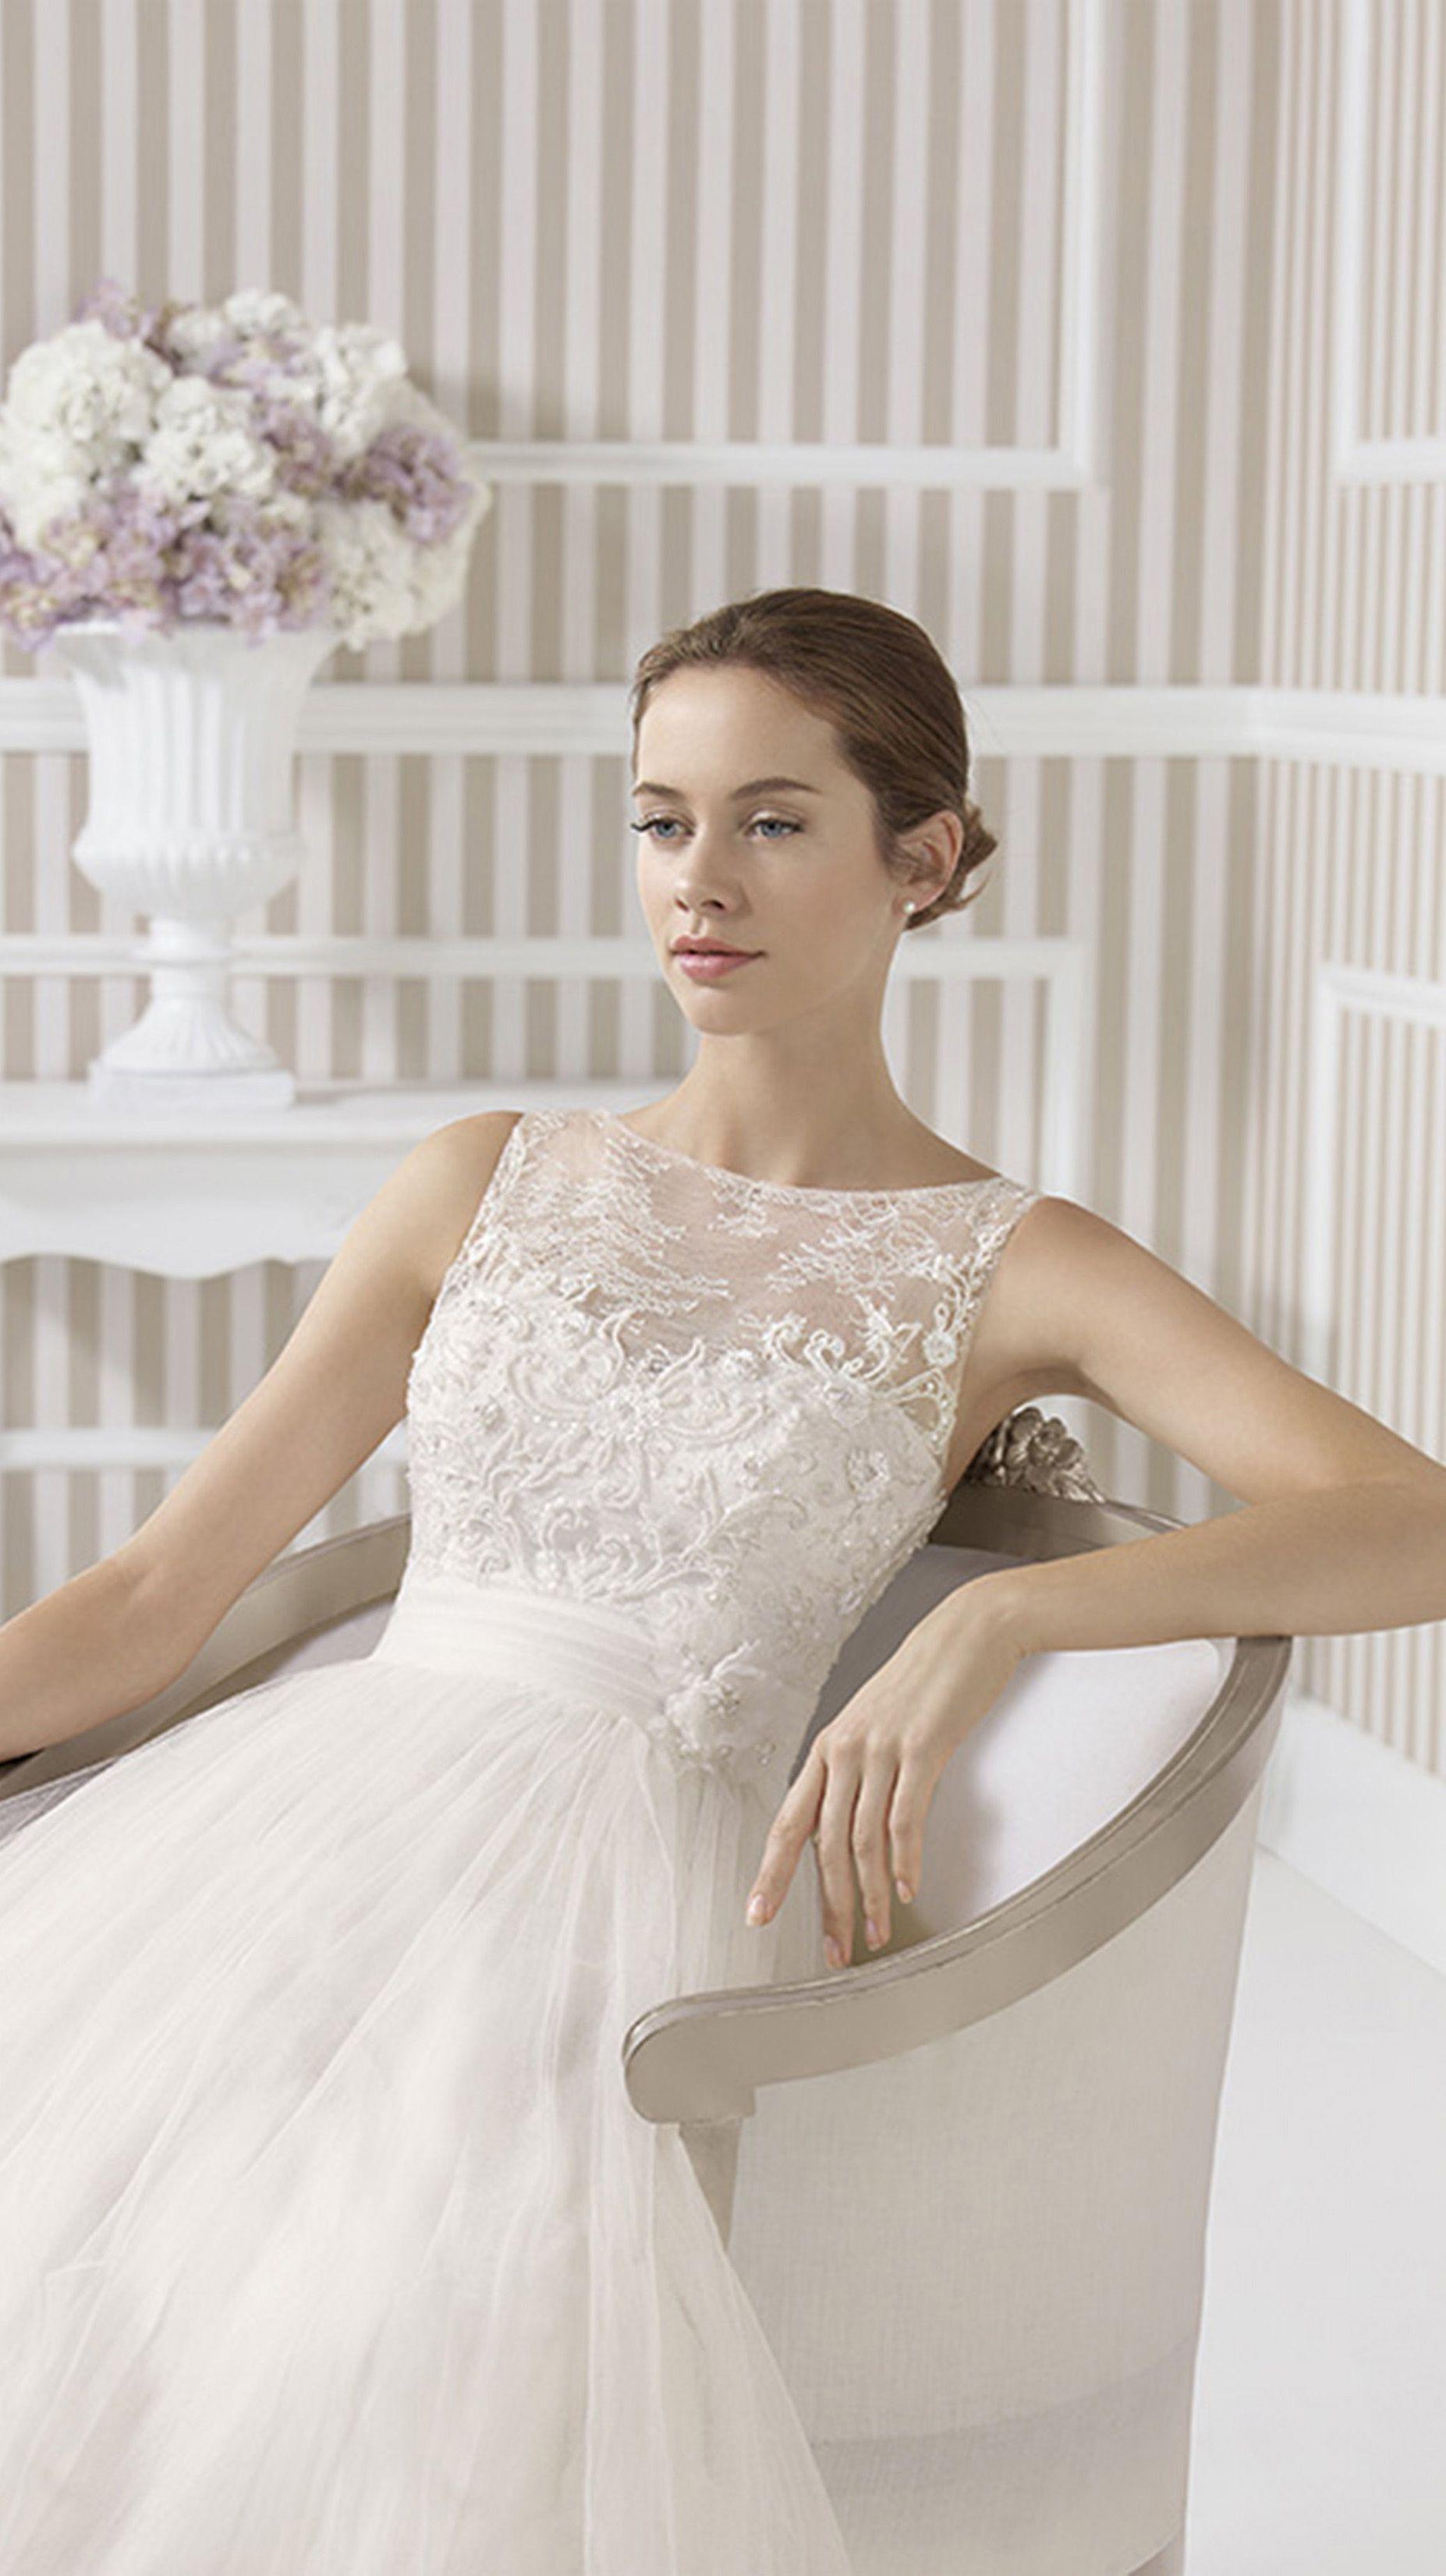 3b76ecb18208 $195.49-Beautiful A-Line Long Lace Sleeveless Satin&Tulle Wedding Dress  With Illusion Back.